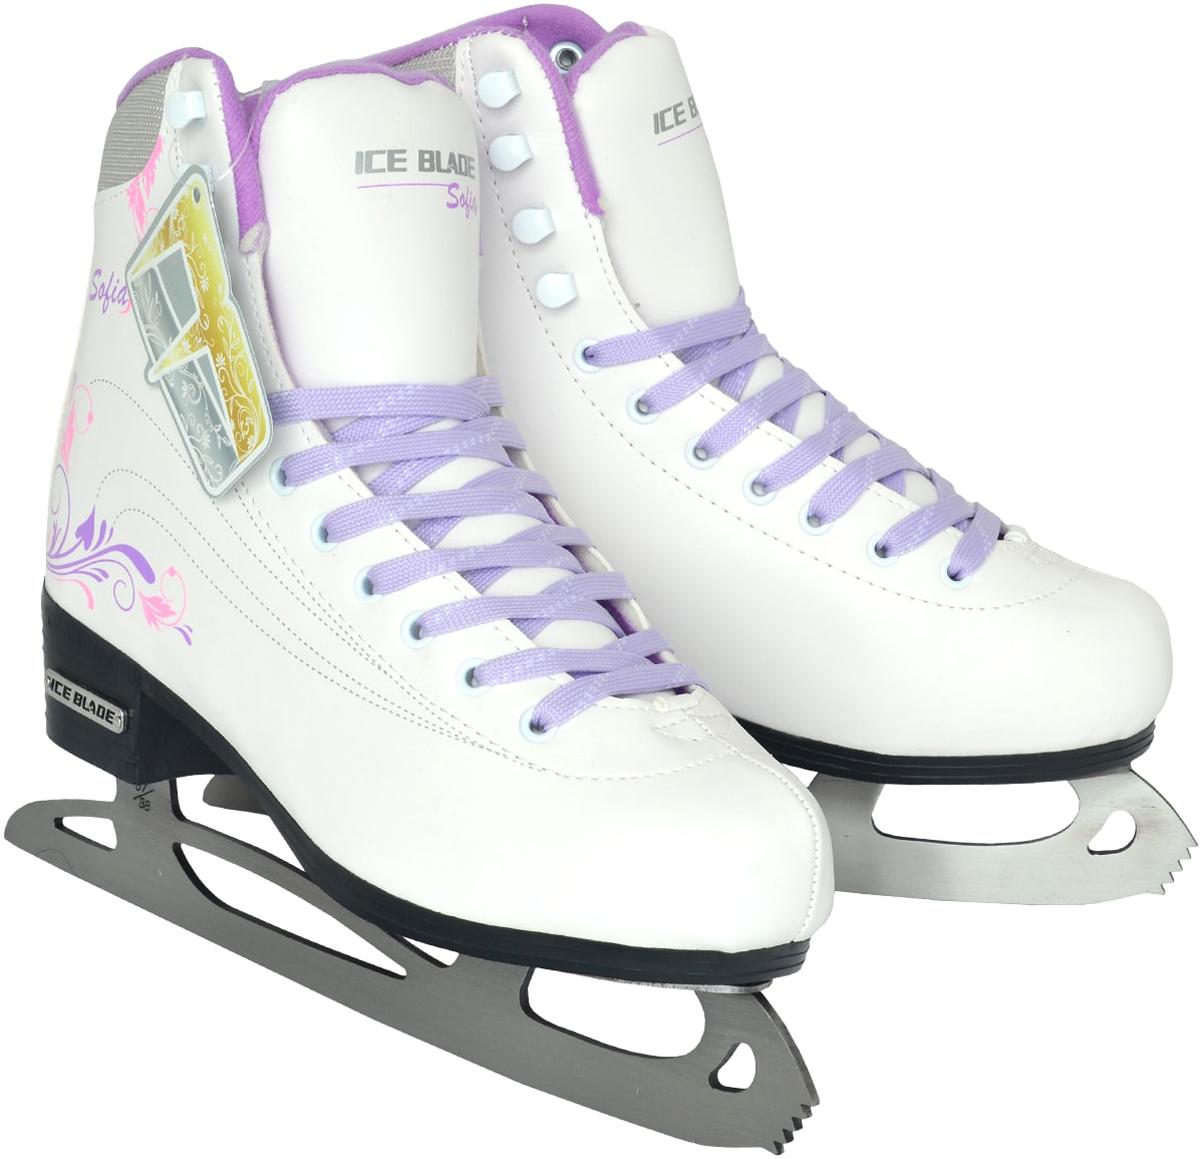 Коньки фигурные женские Ice Blade Sofia, цвет: белый, сиреневый. Размер 35 пластина ada ice blade 150 1000мм